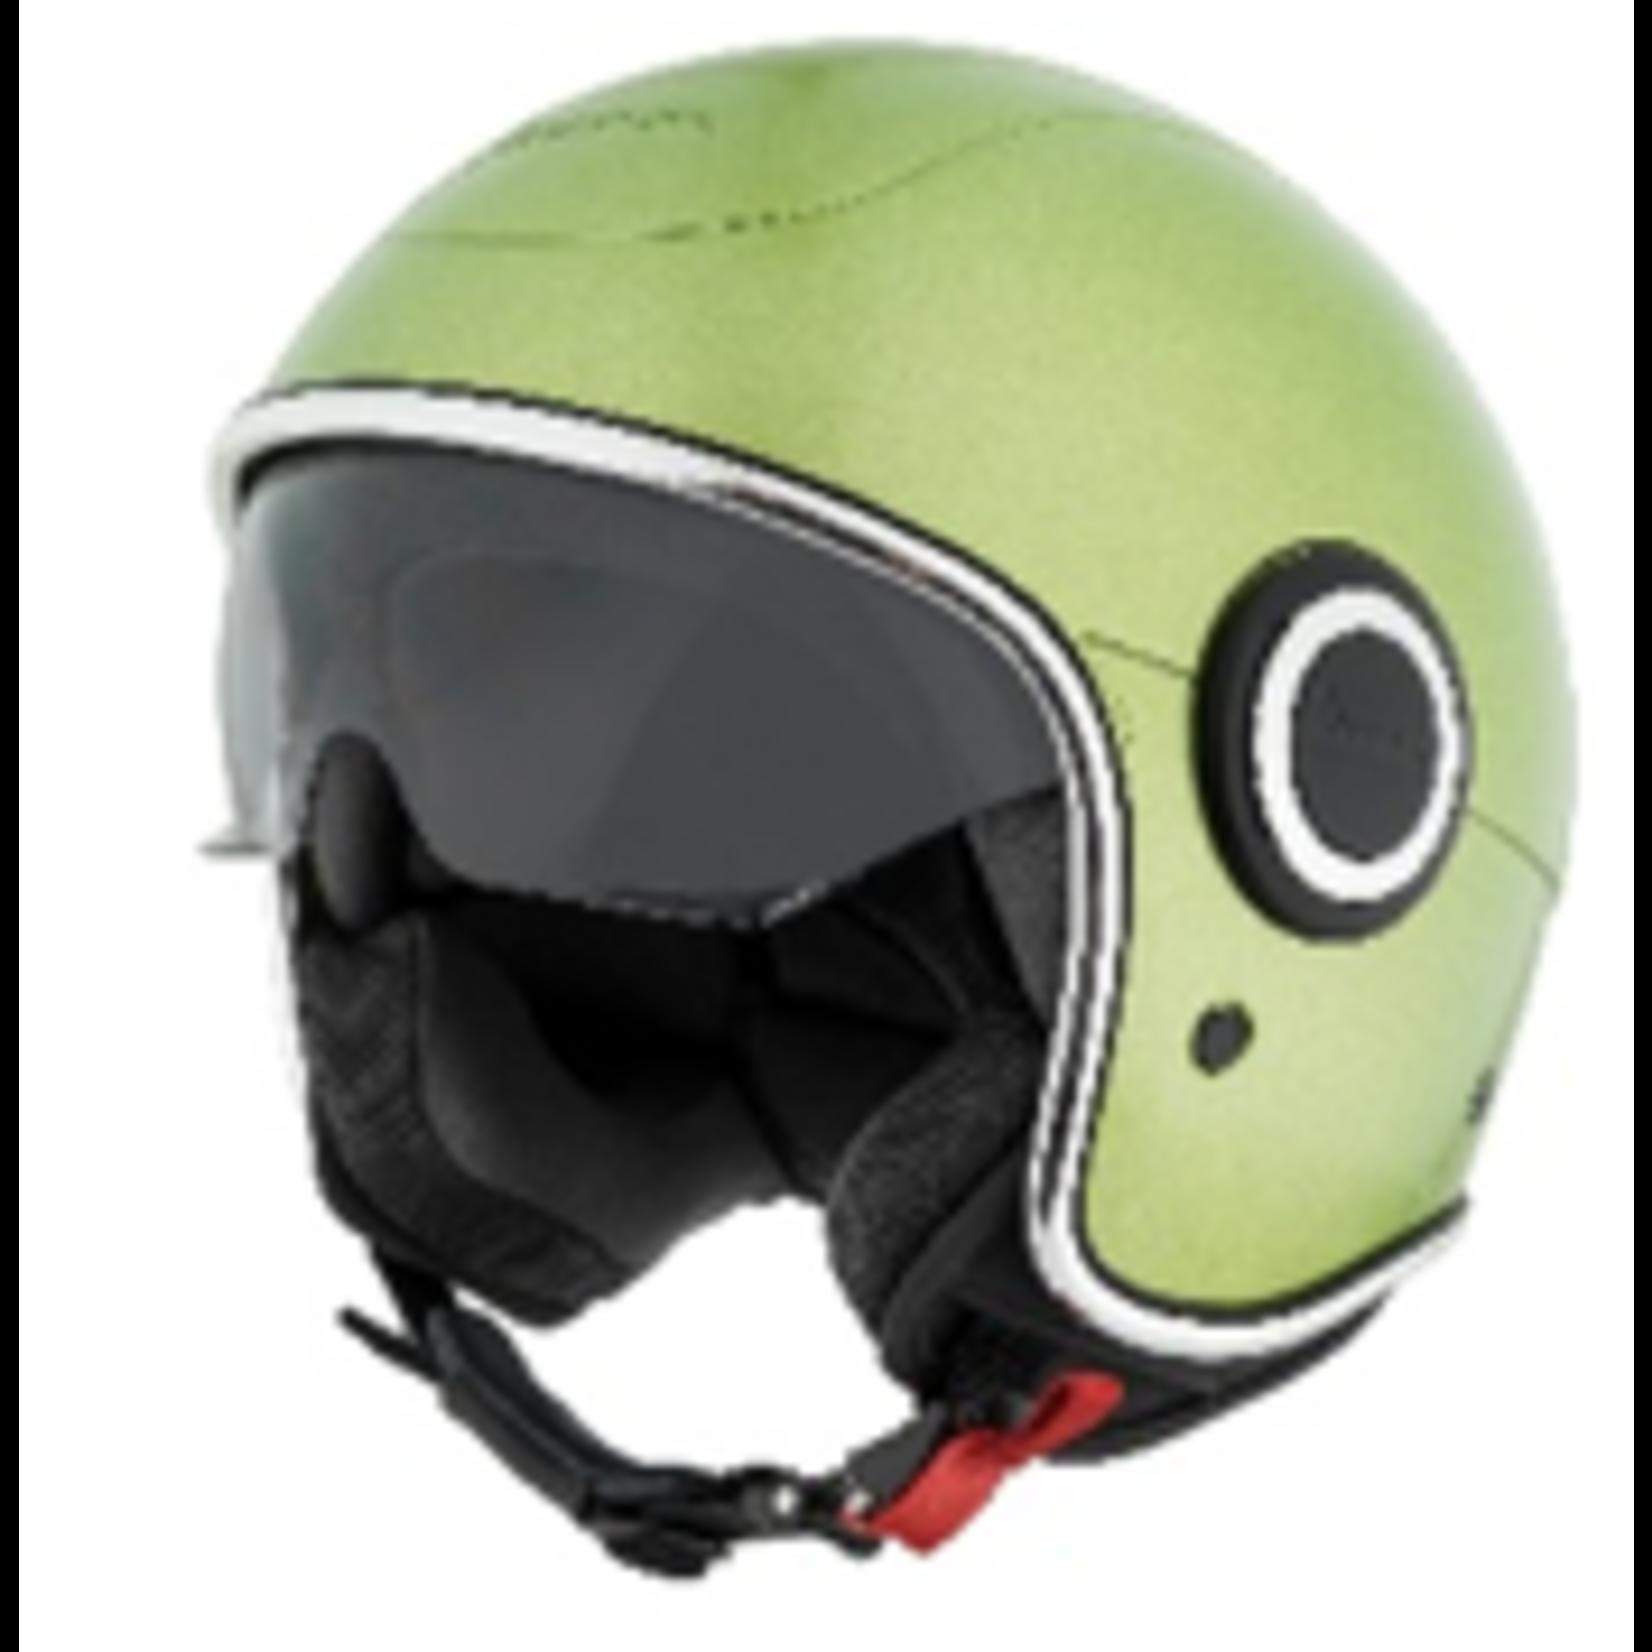 Apparel Helmet, Vespa VJ1 Green Met.341/A